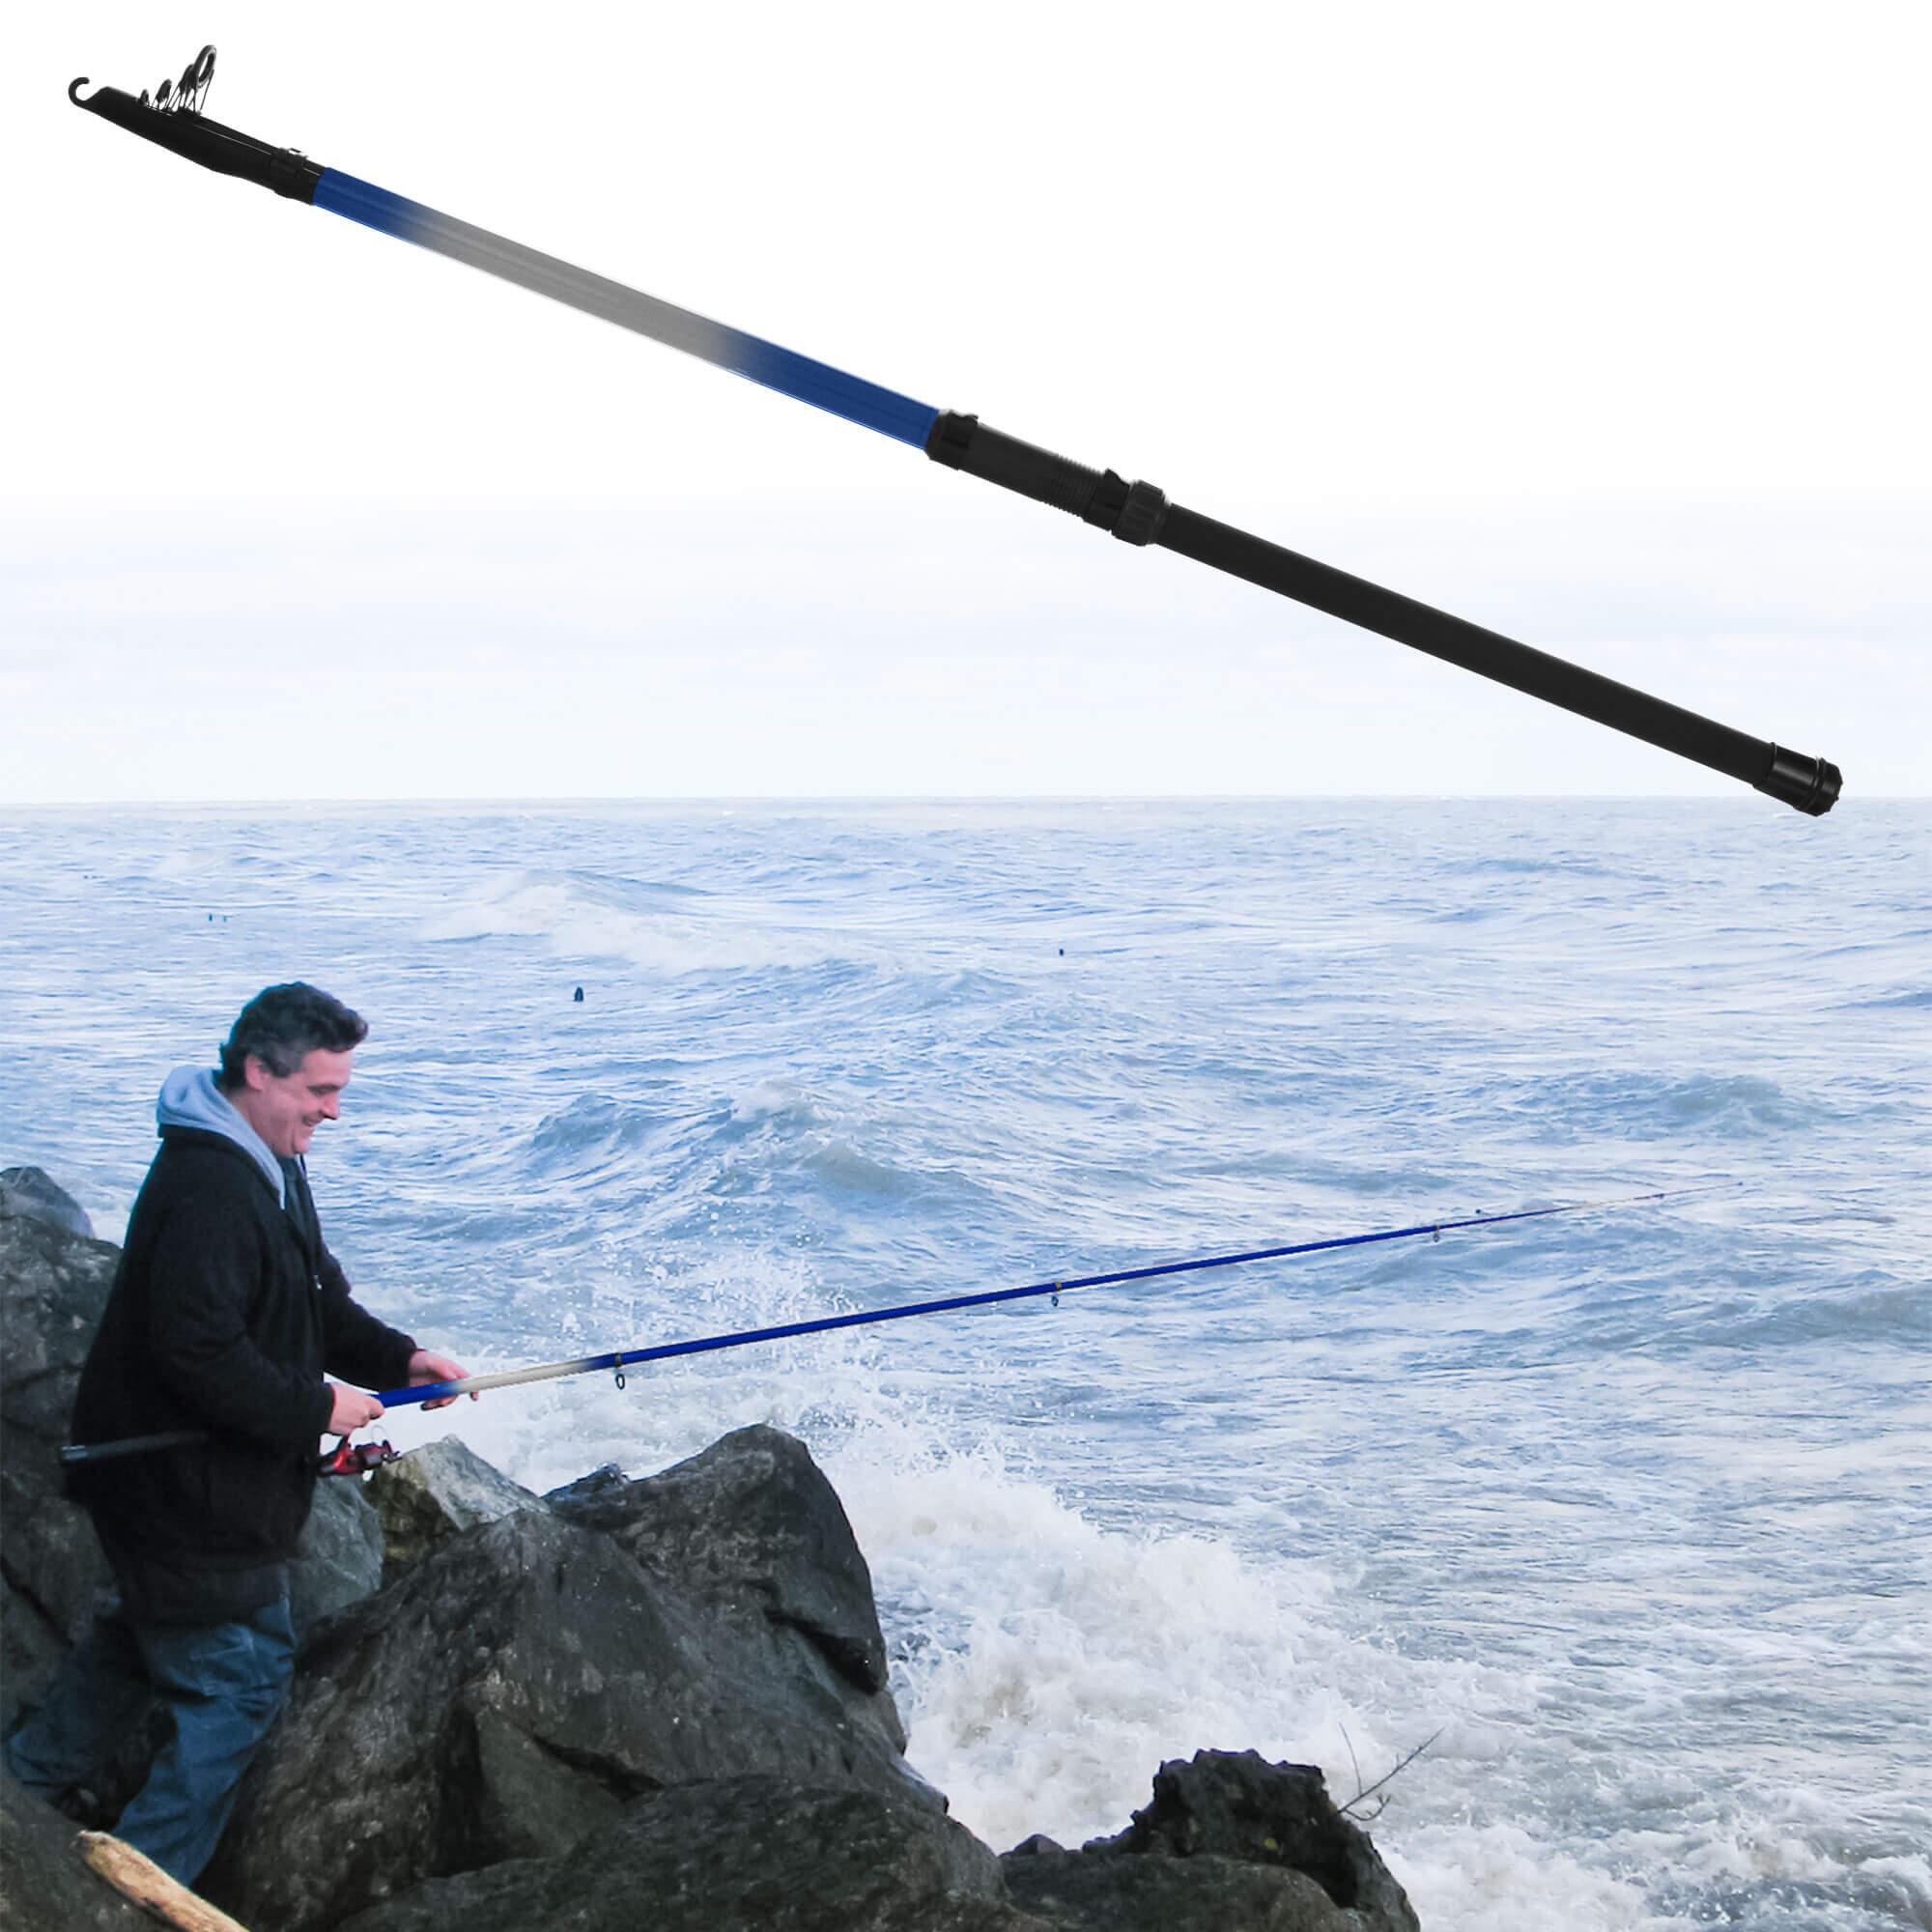 Gone fishing telescoping fishing rod up to 9 5 feet blue for Blue fishing rod